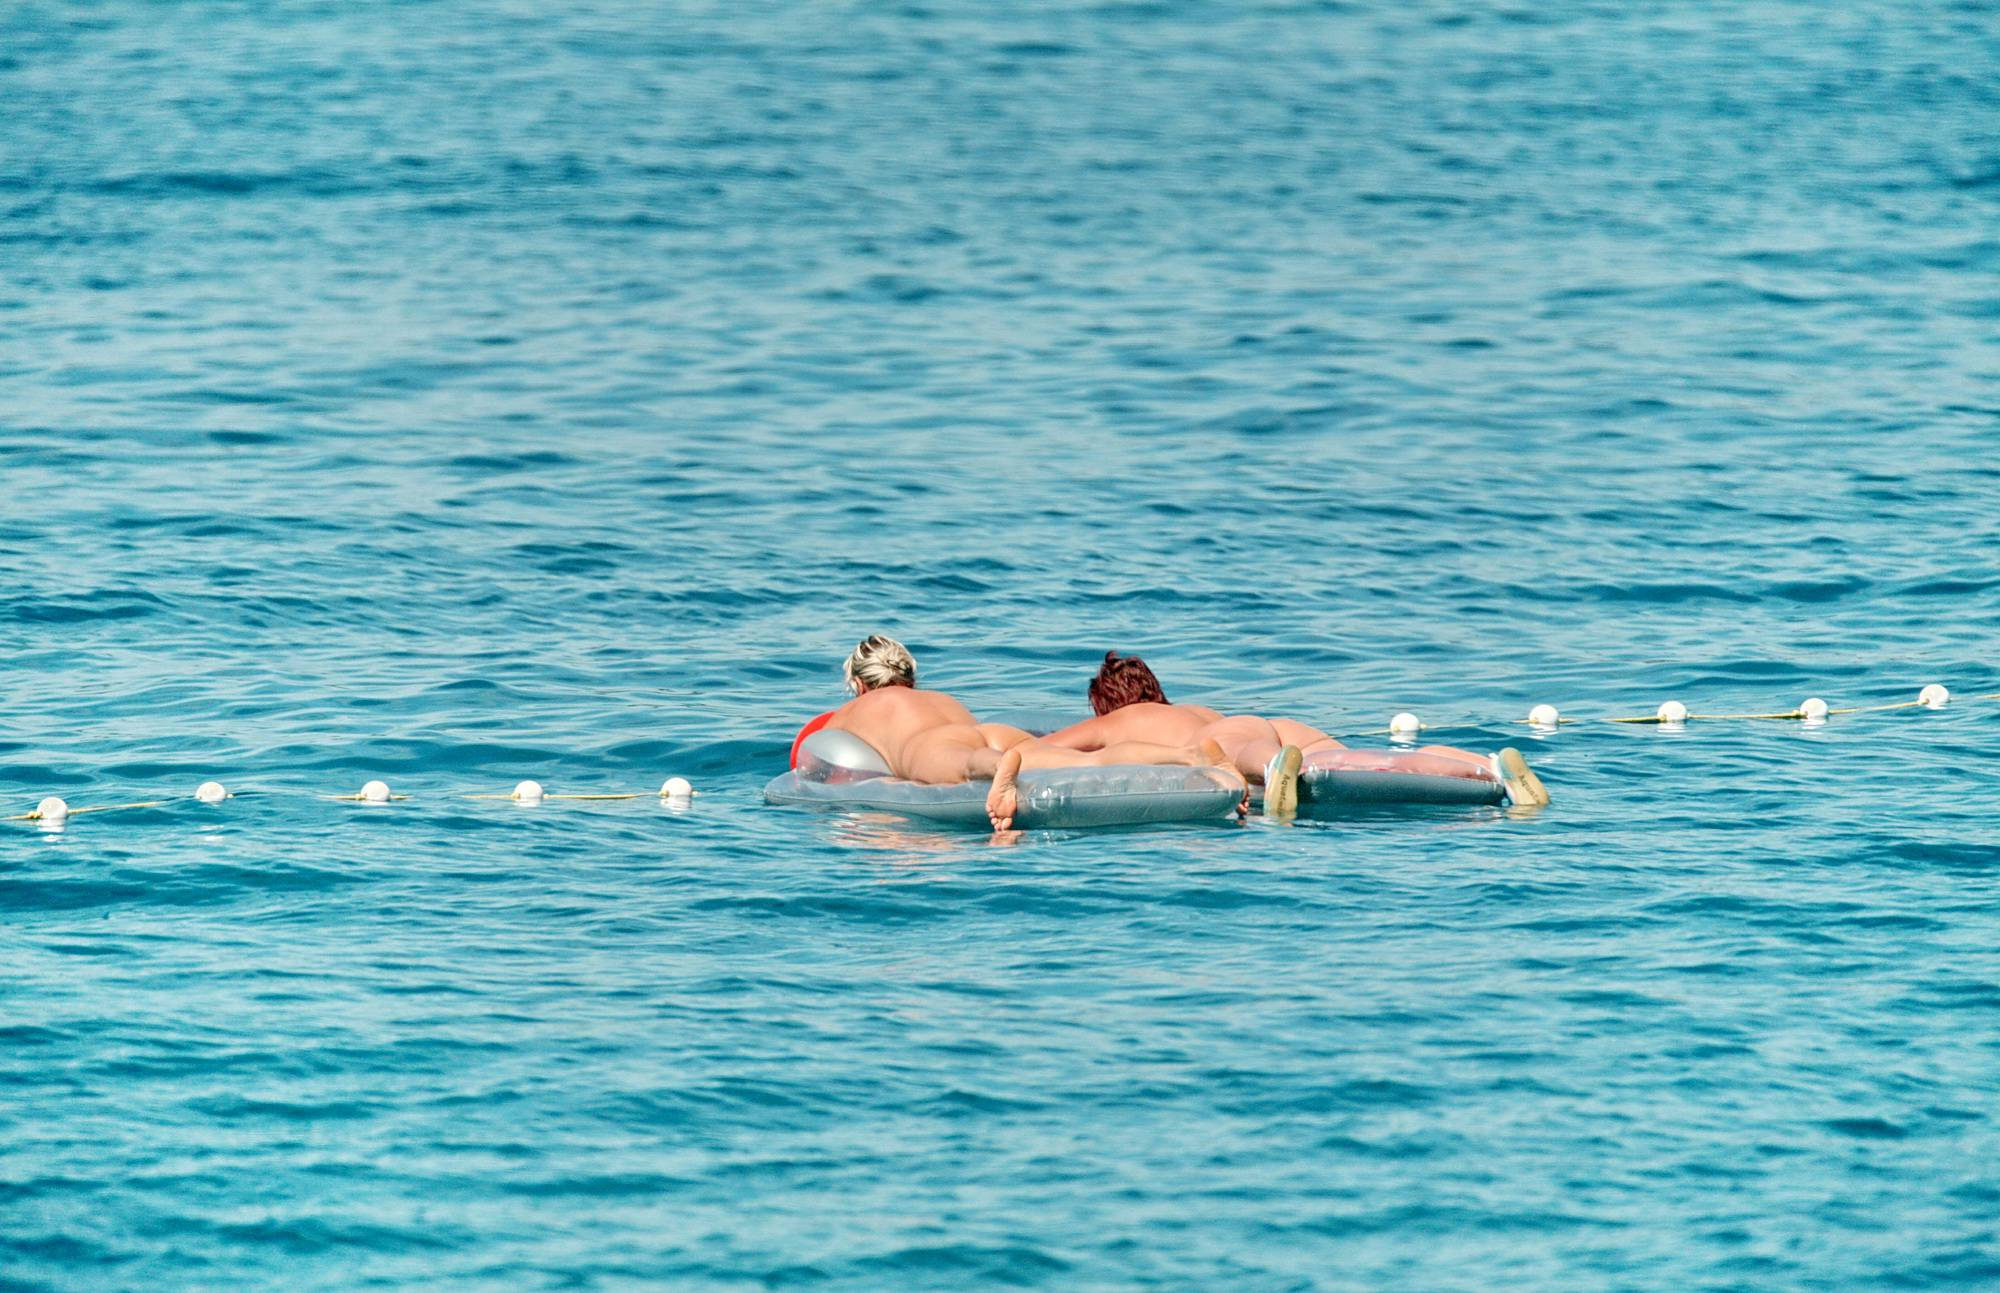 Nudist Pics Adult On Water Floaters - 1